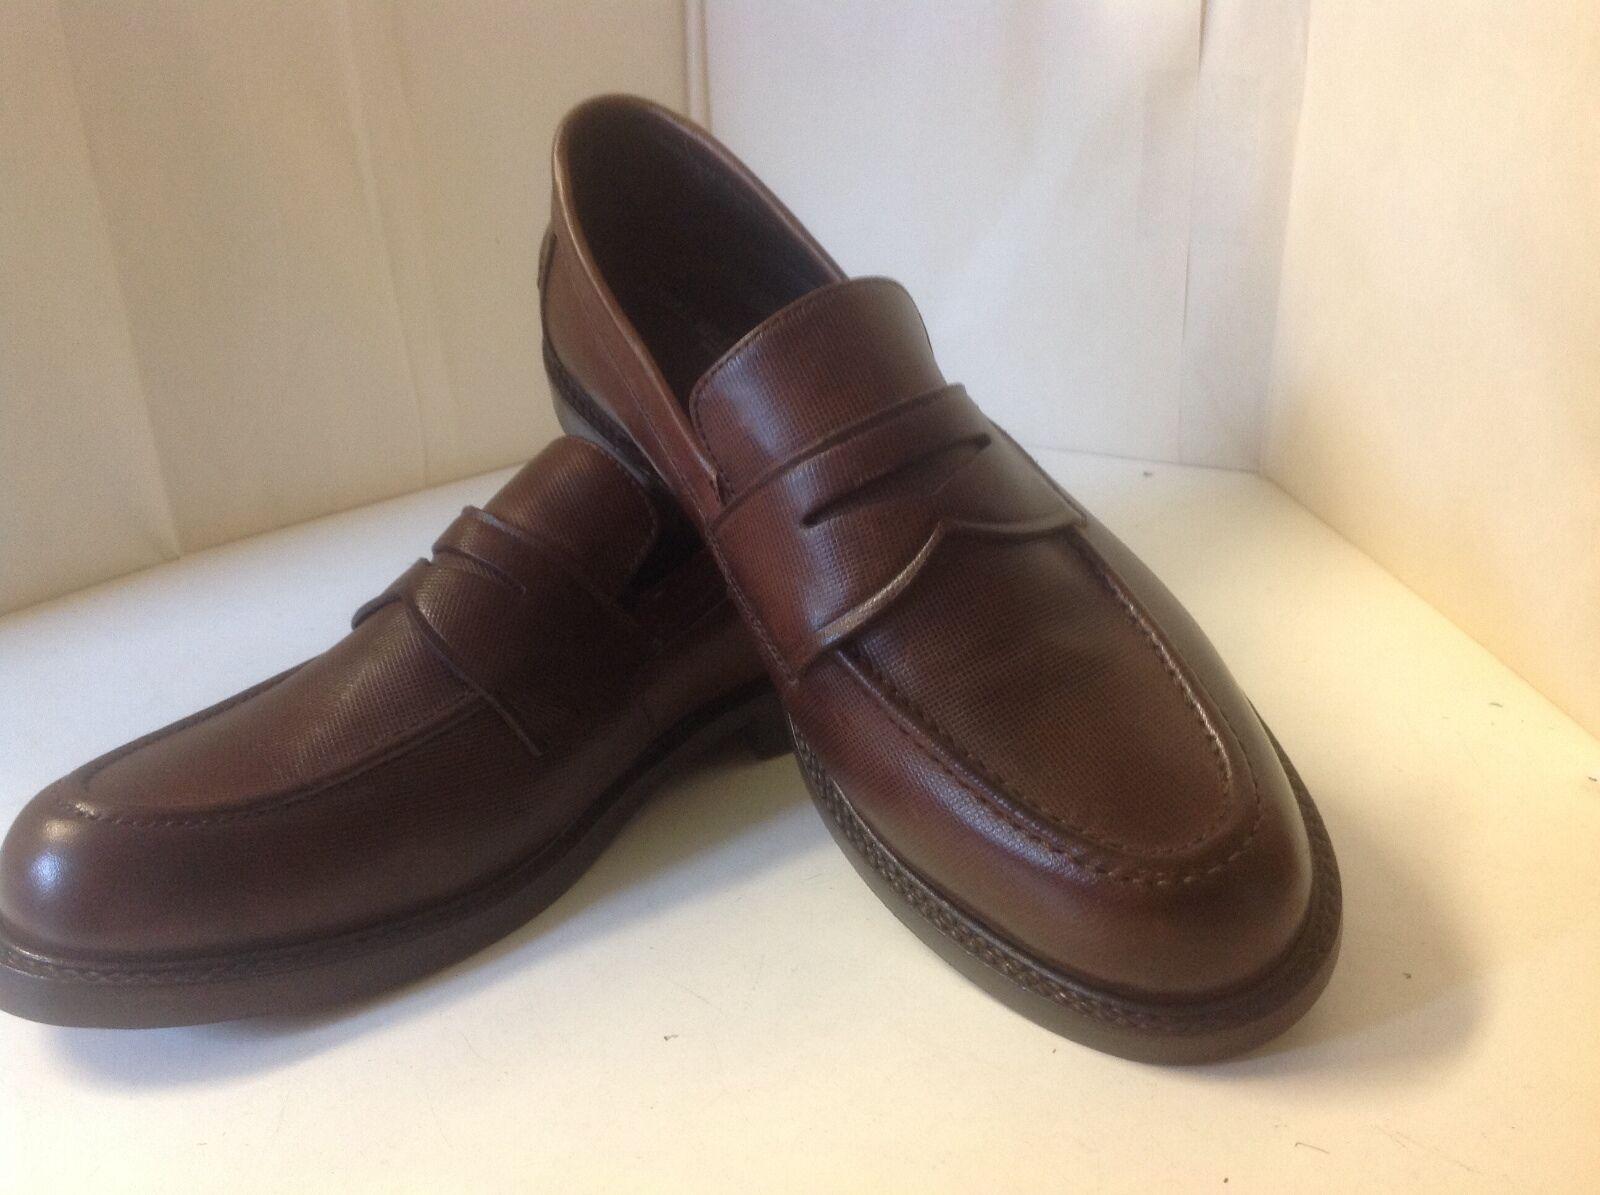 Local Uniform Leder Slipper Neu braun 8 1 2 M Hergestellt in Brasilien Schuhe